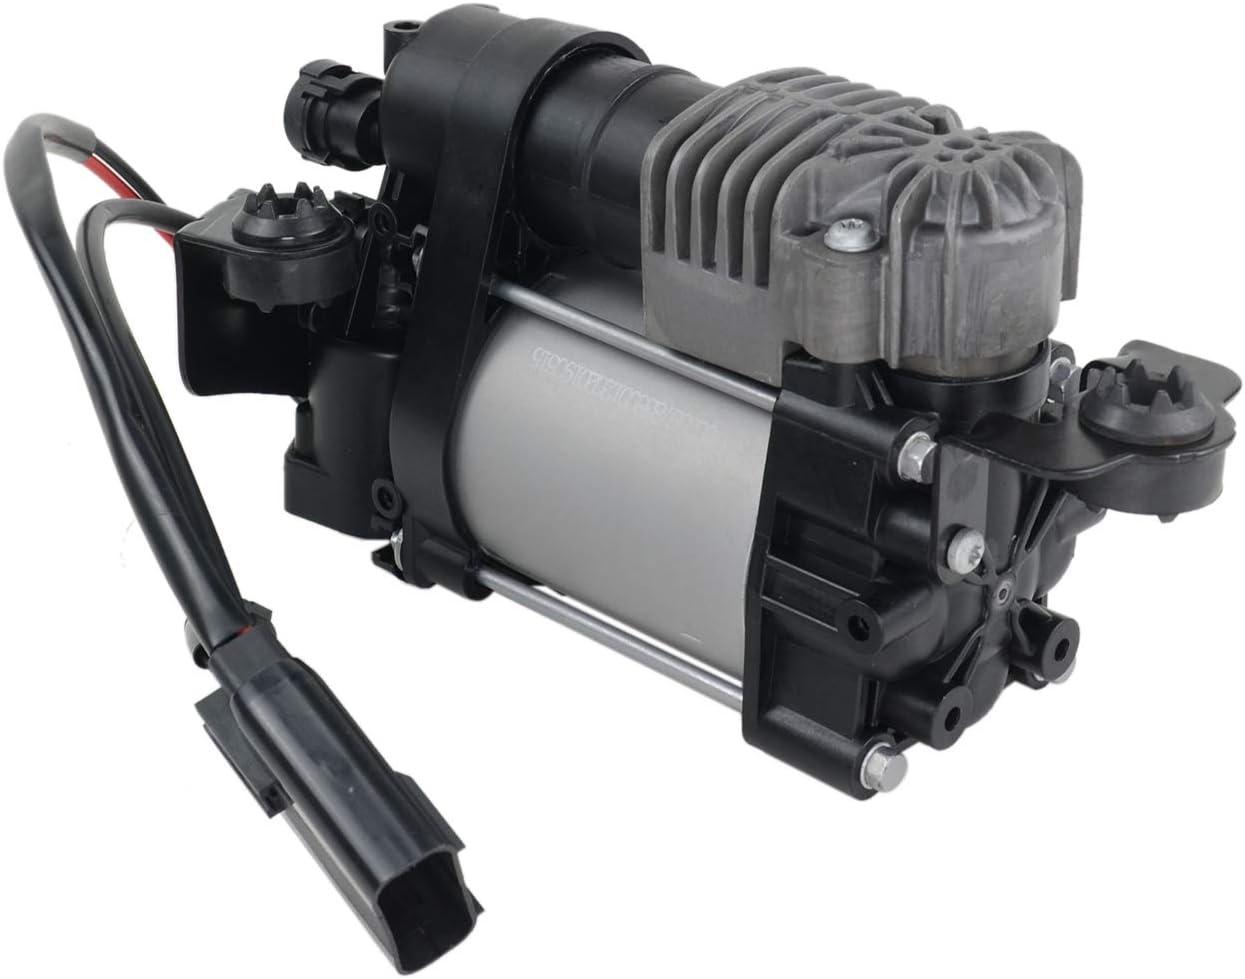 Air Suspension Kompressor Pumpe Kompressorpumpe 68204730ad 68041137af 68204730ab Auto